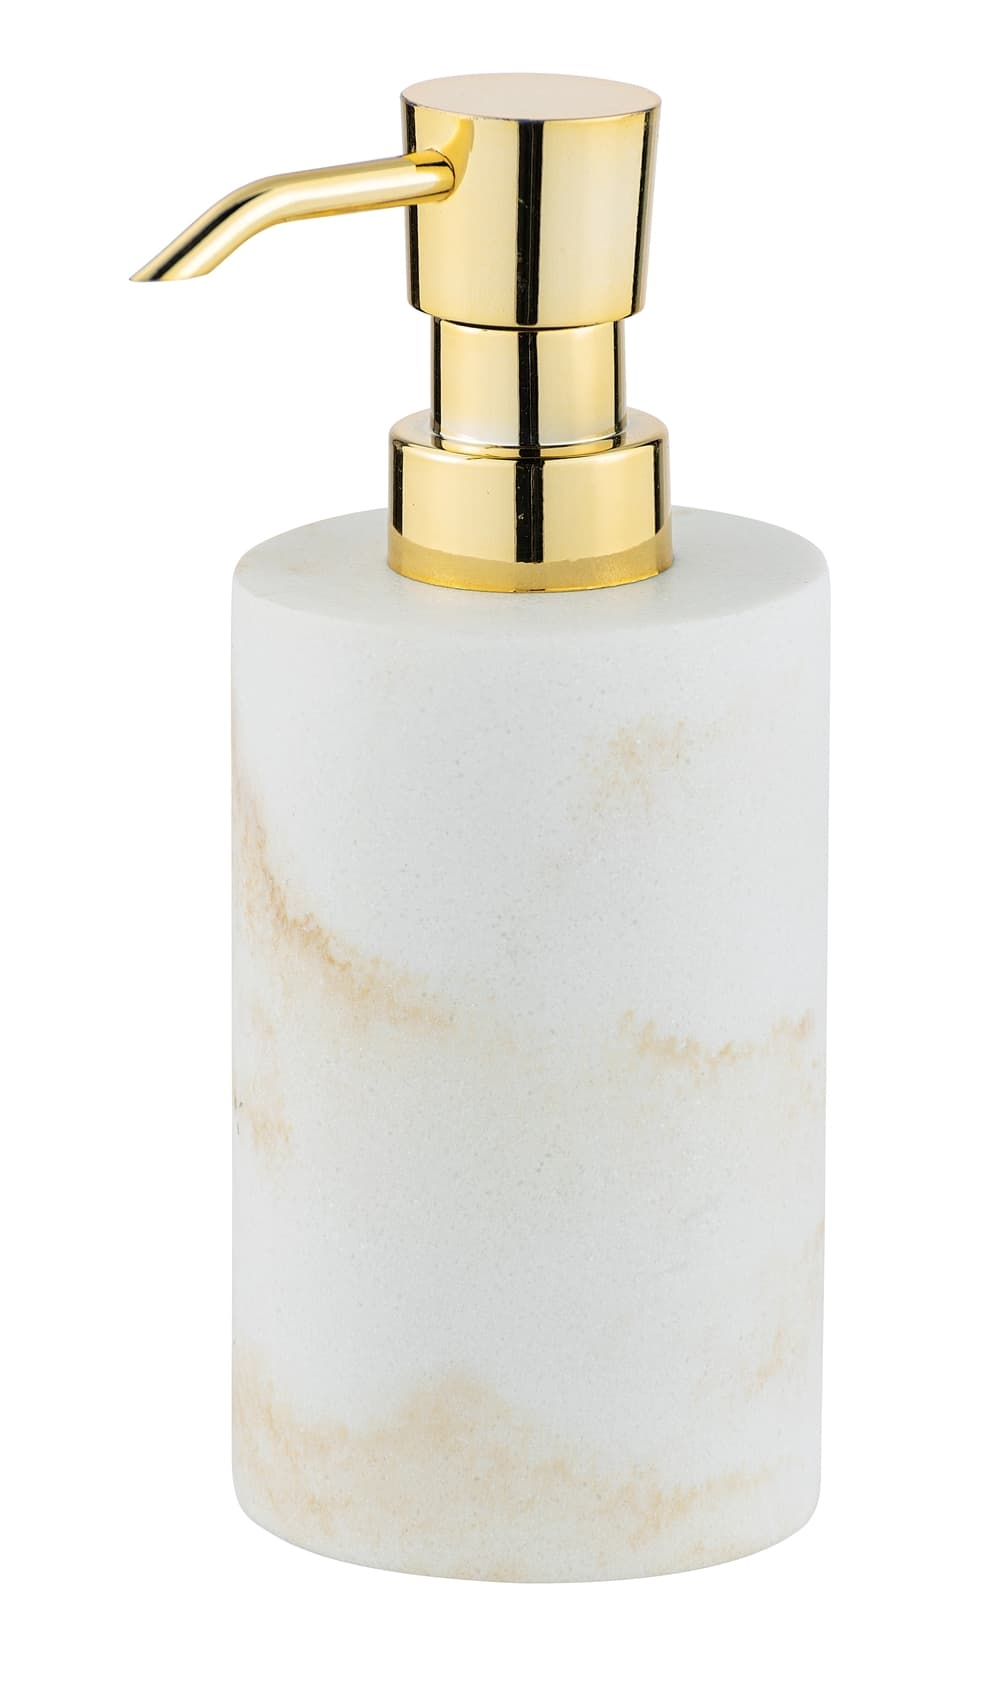 Dozator pentru sapun, din polirasina, Odos Alb / Auriu, Ø7xH18 cm imagine